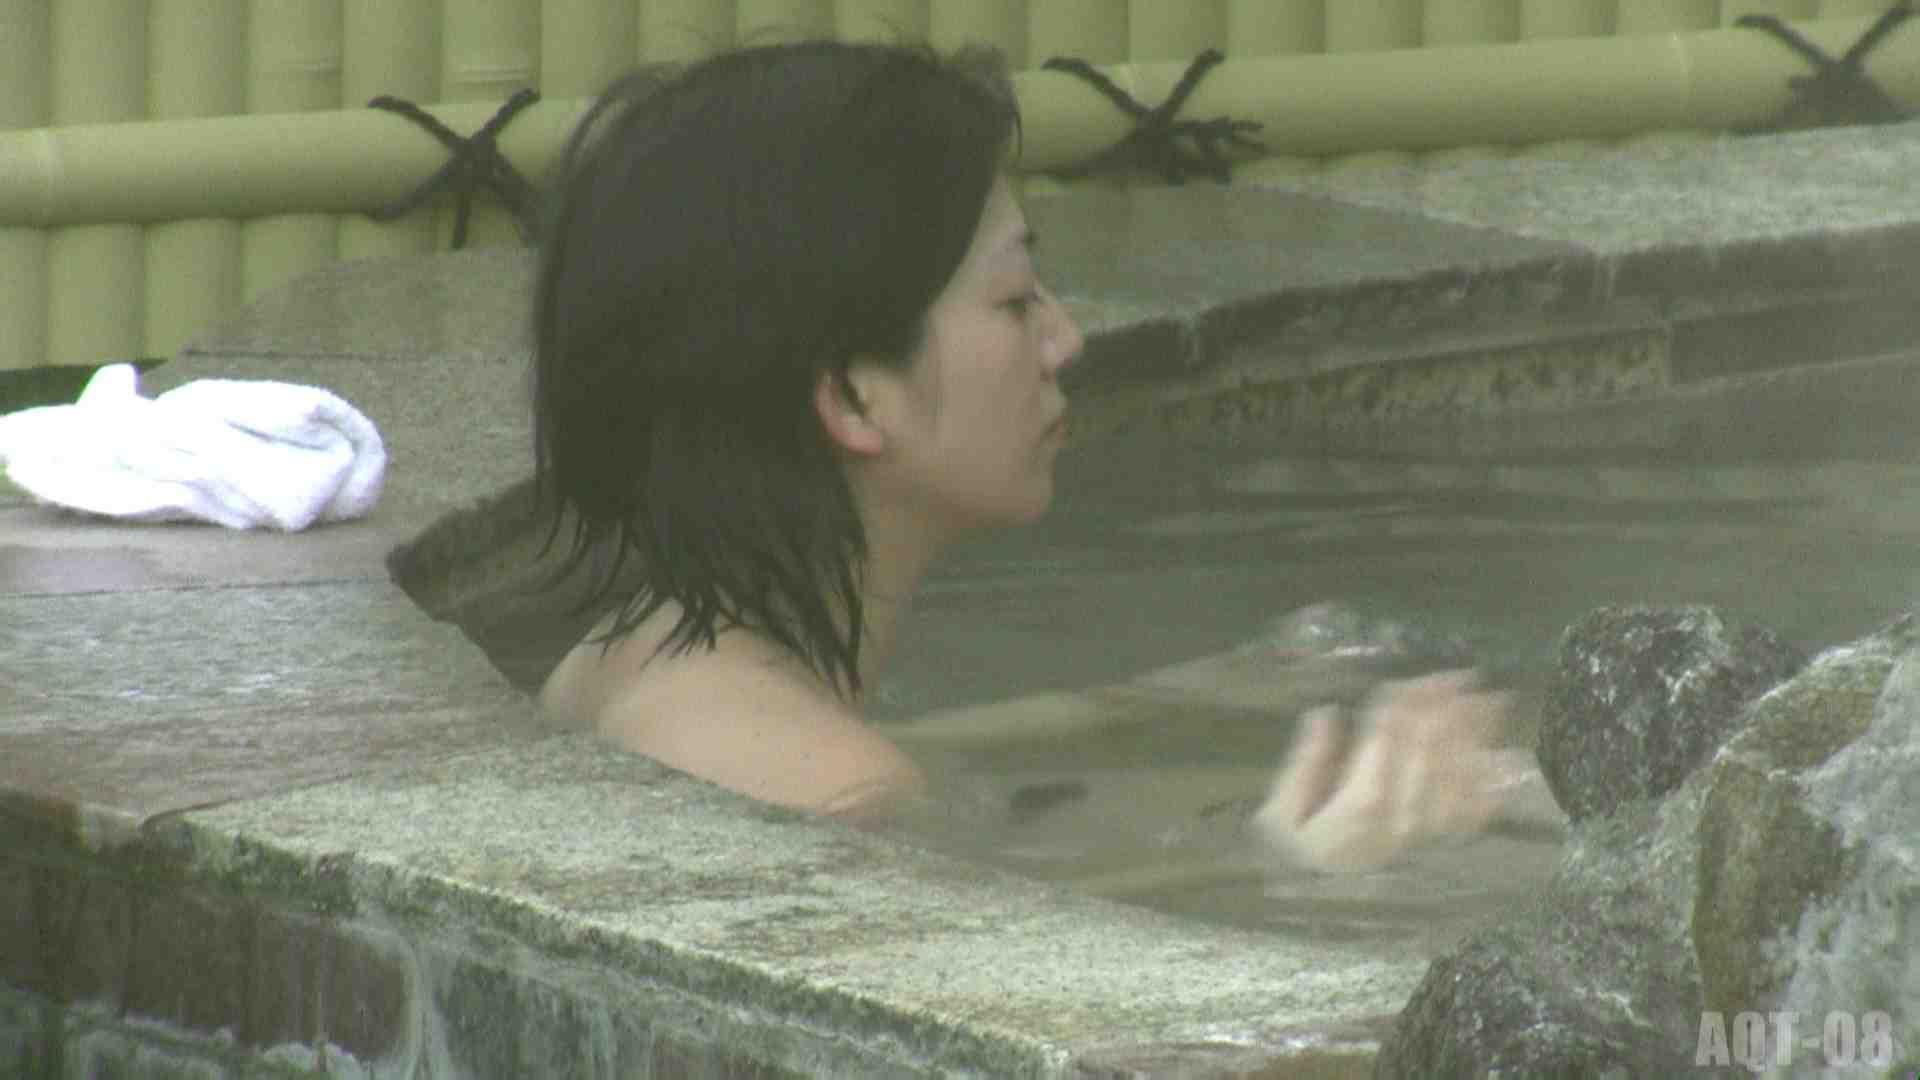 Aquaな露天風呂Vol.776 盗撮 | HなOL  60pic 34